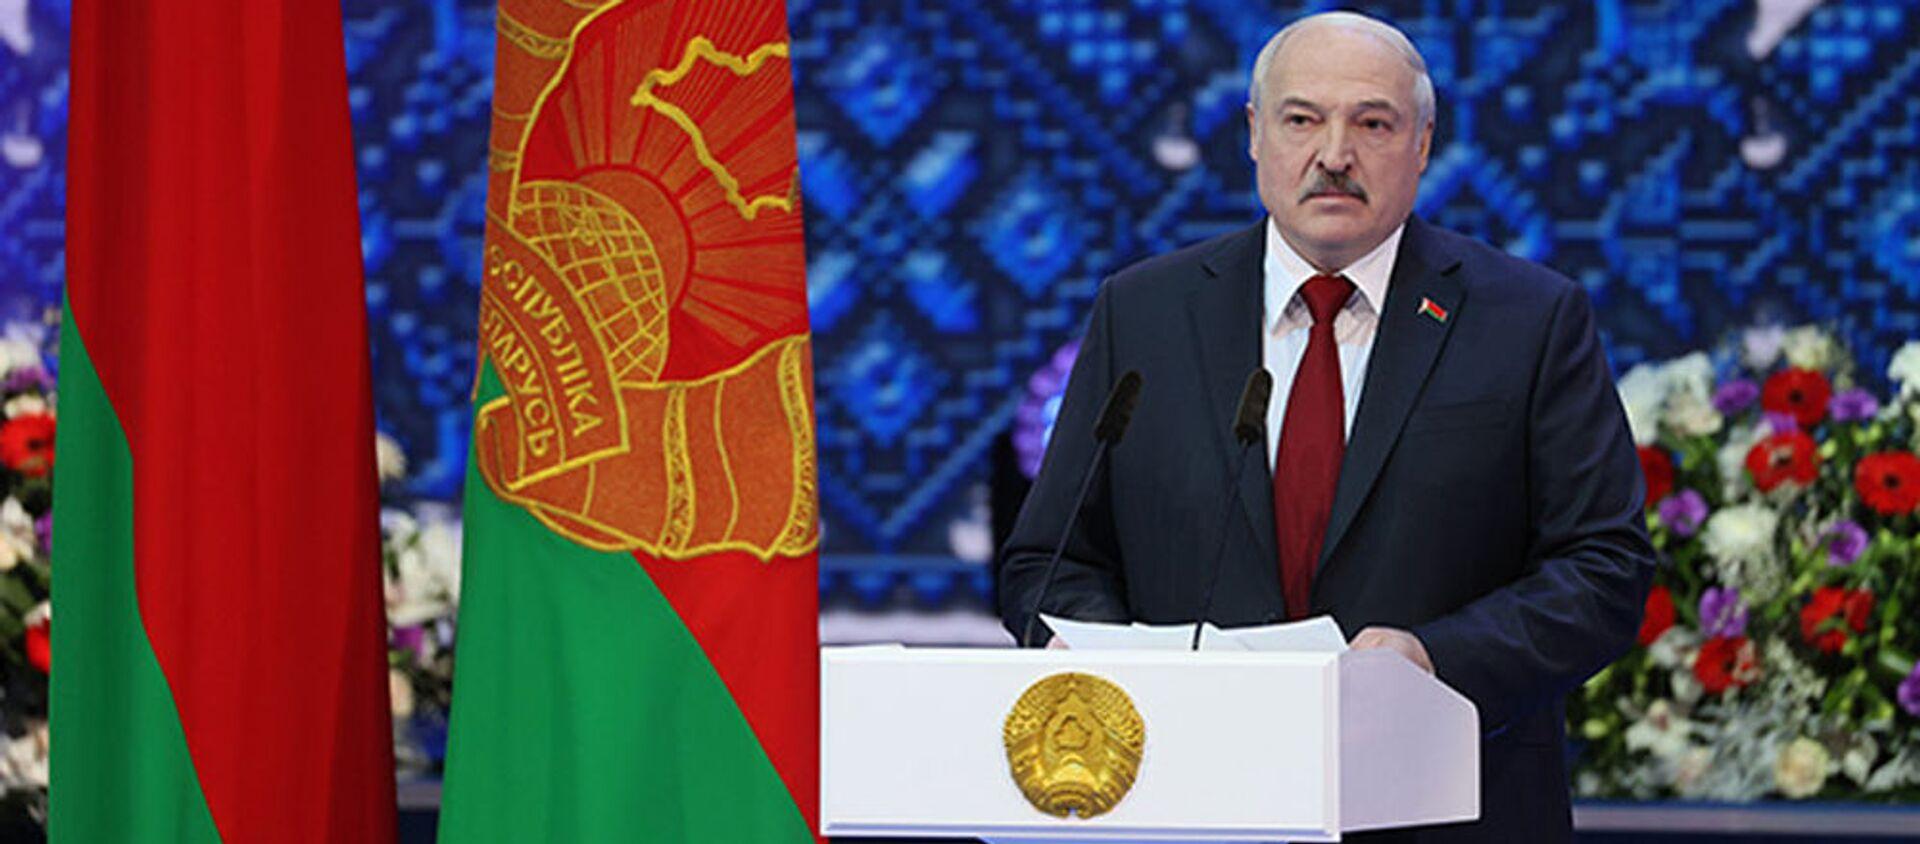 Александр Лукашенко - Sputnik Беларусь, 1920, 12.01.2021